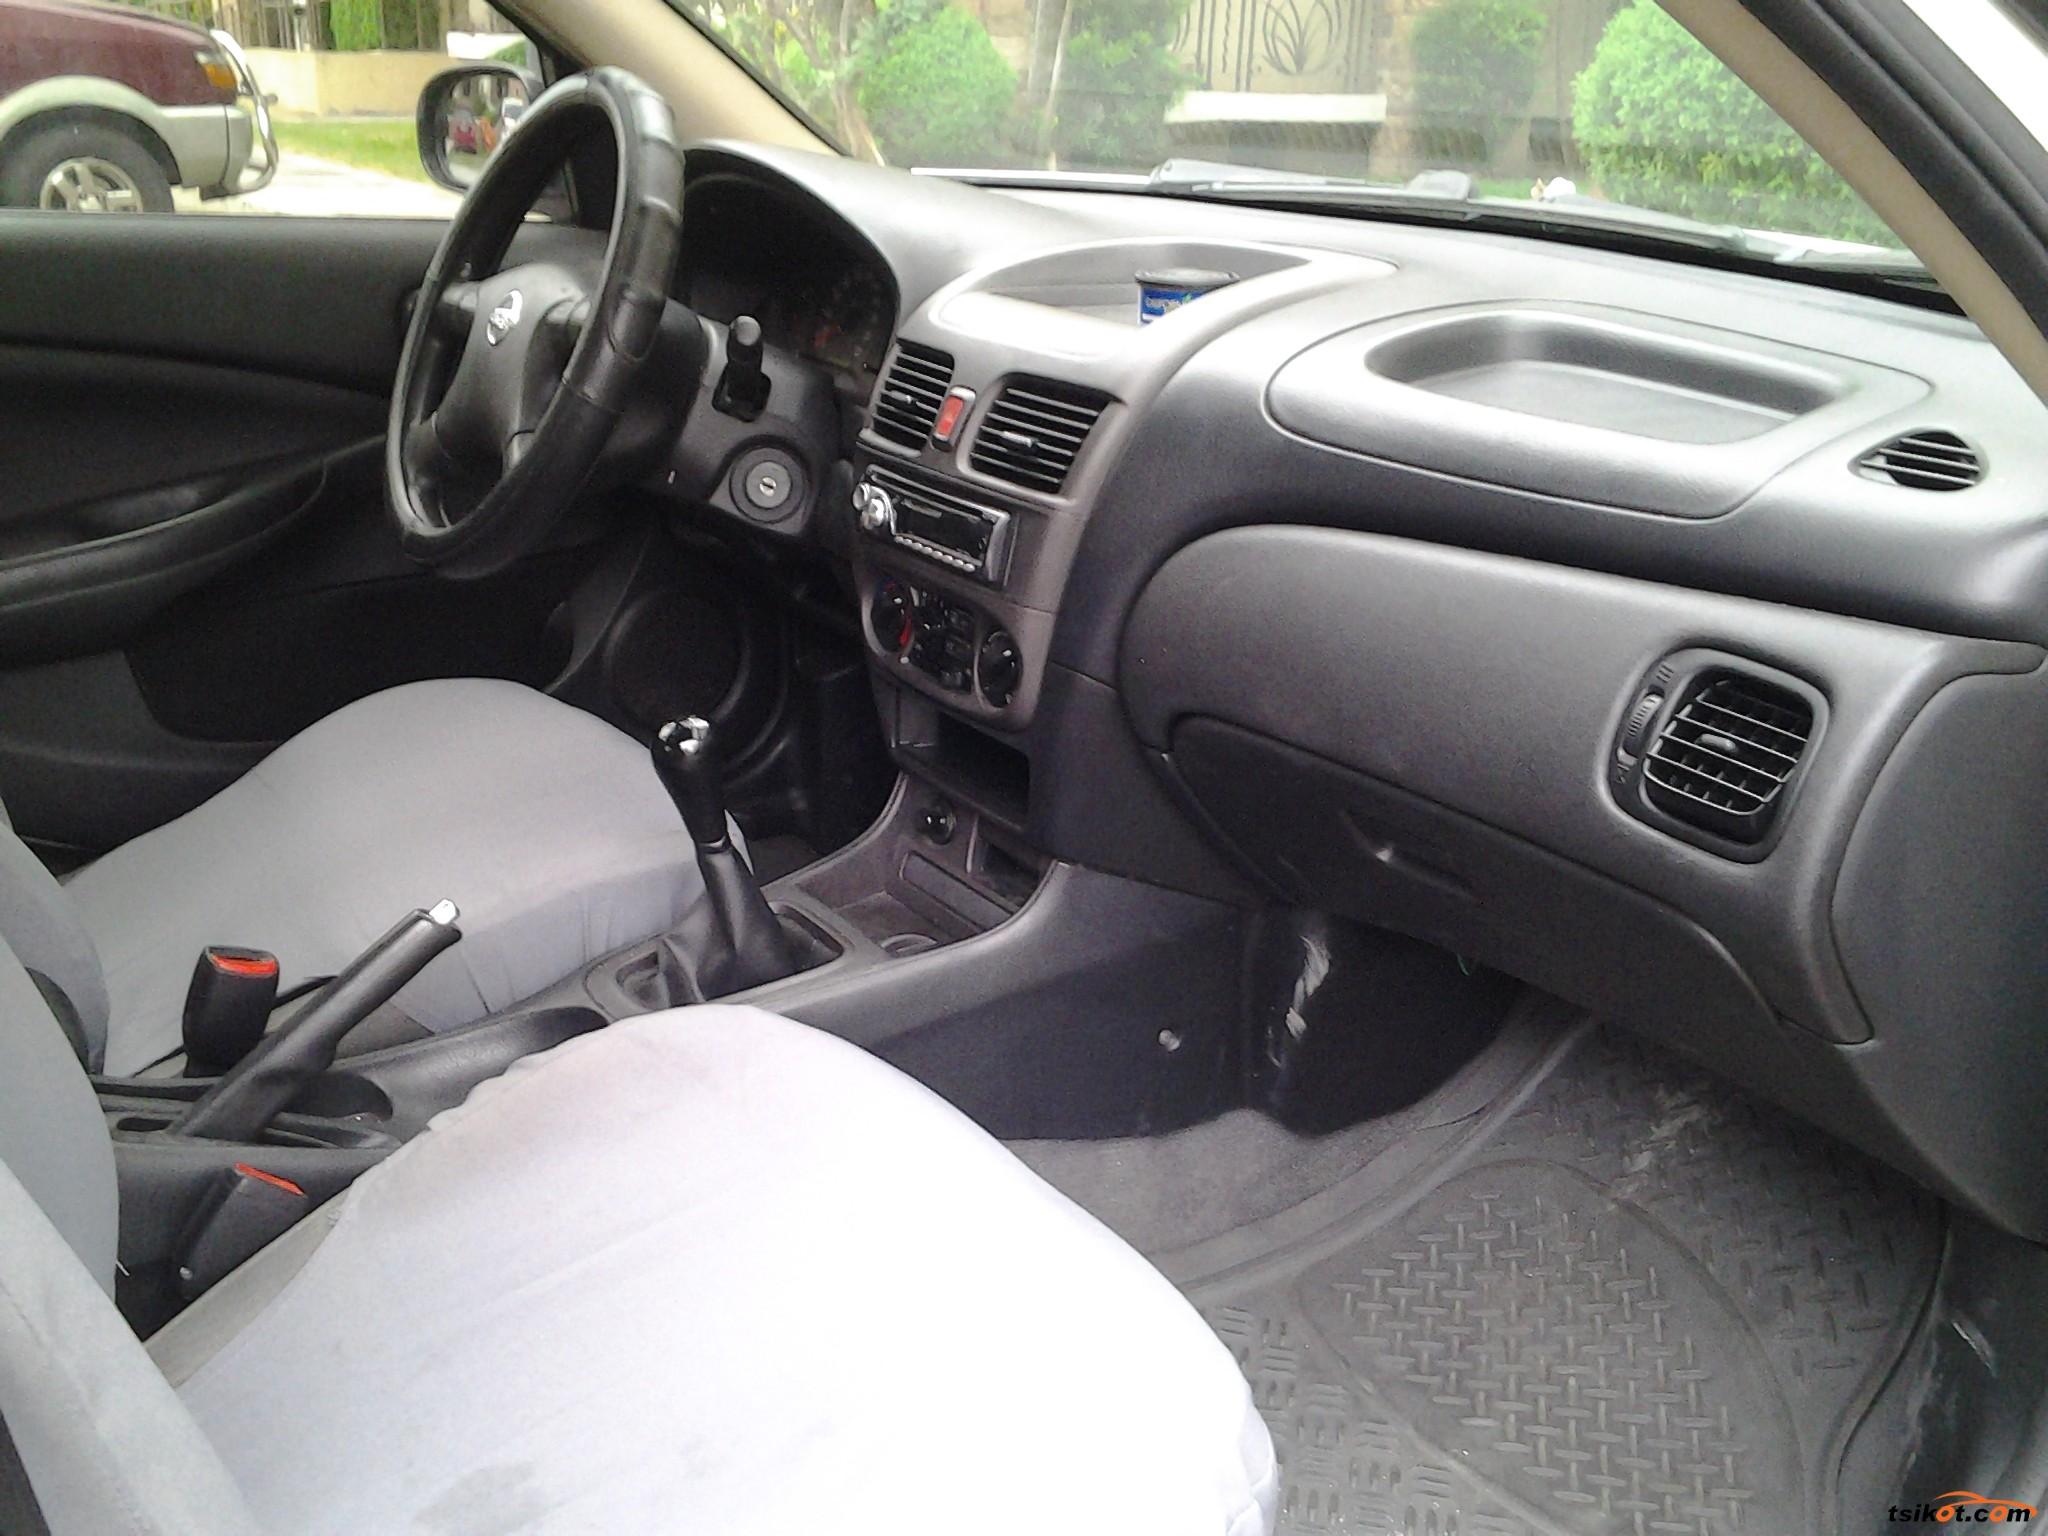 Nissan Sentra 2011 - 3